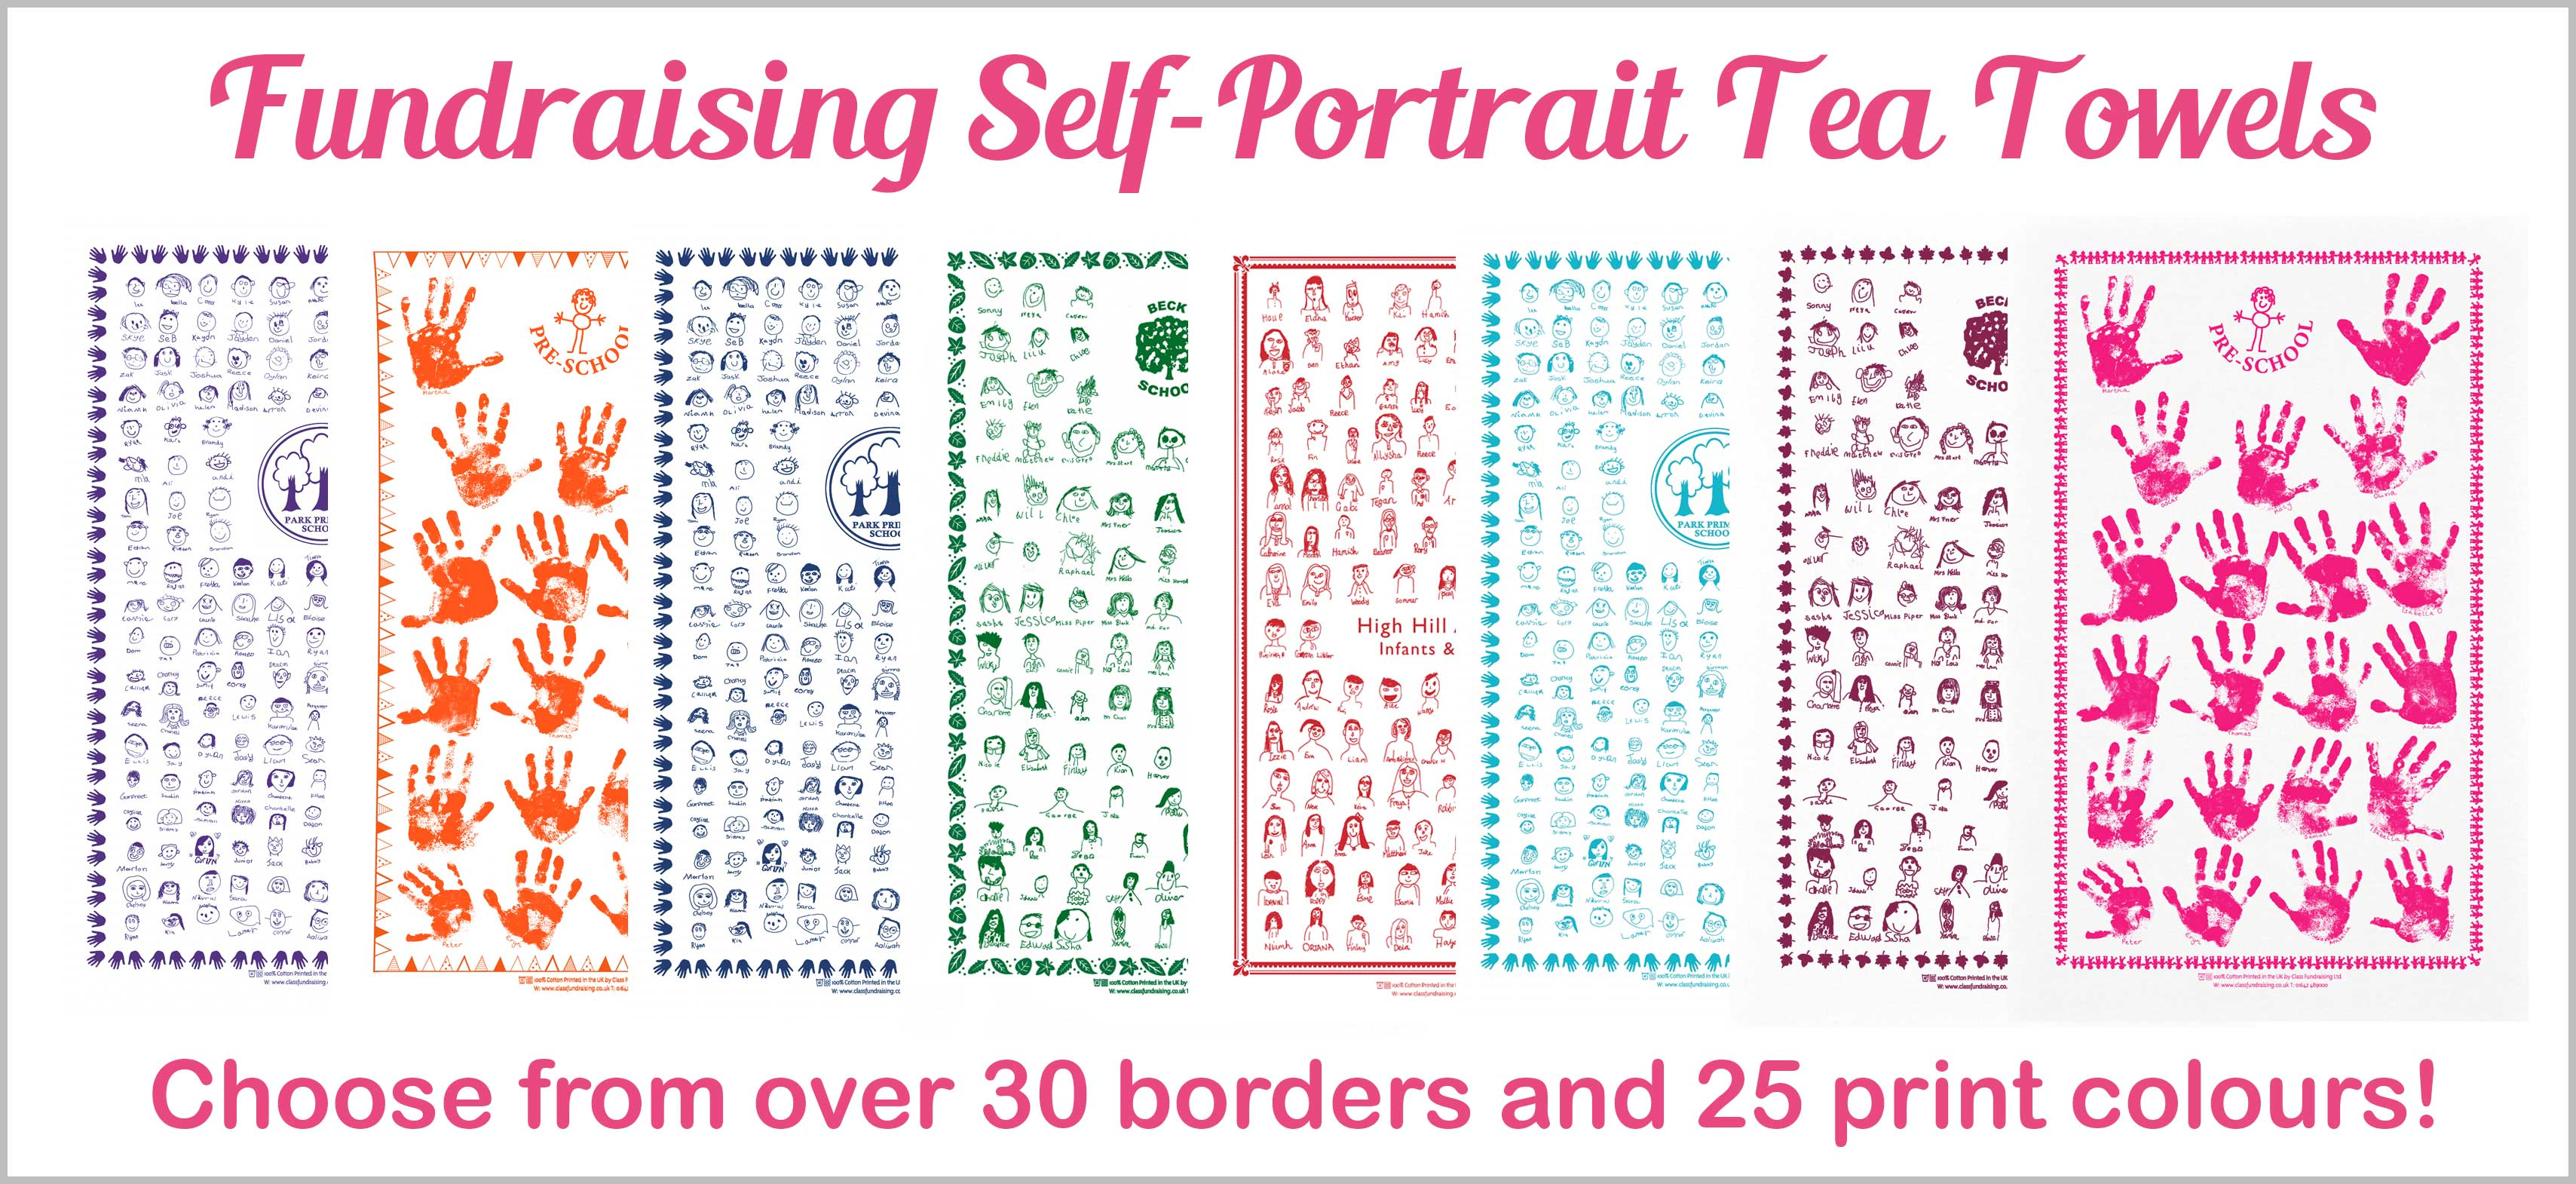 Fundraising Self-Portrait Tea Towels